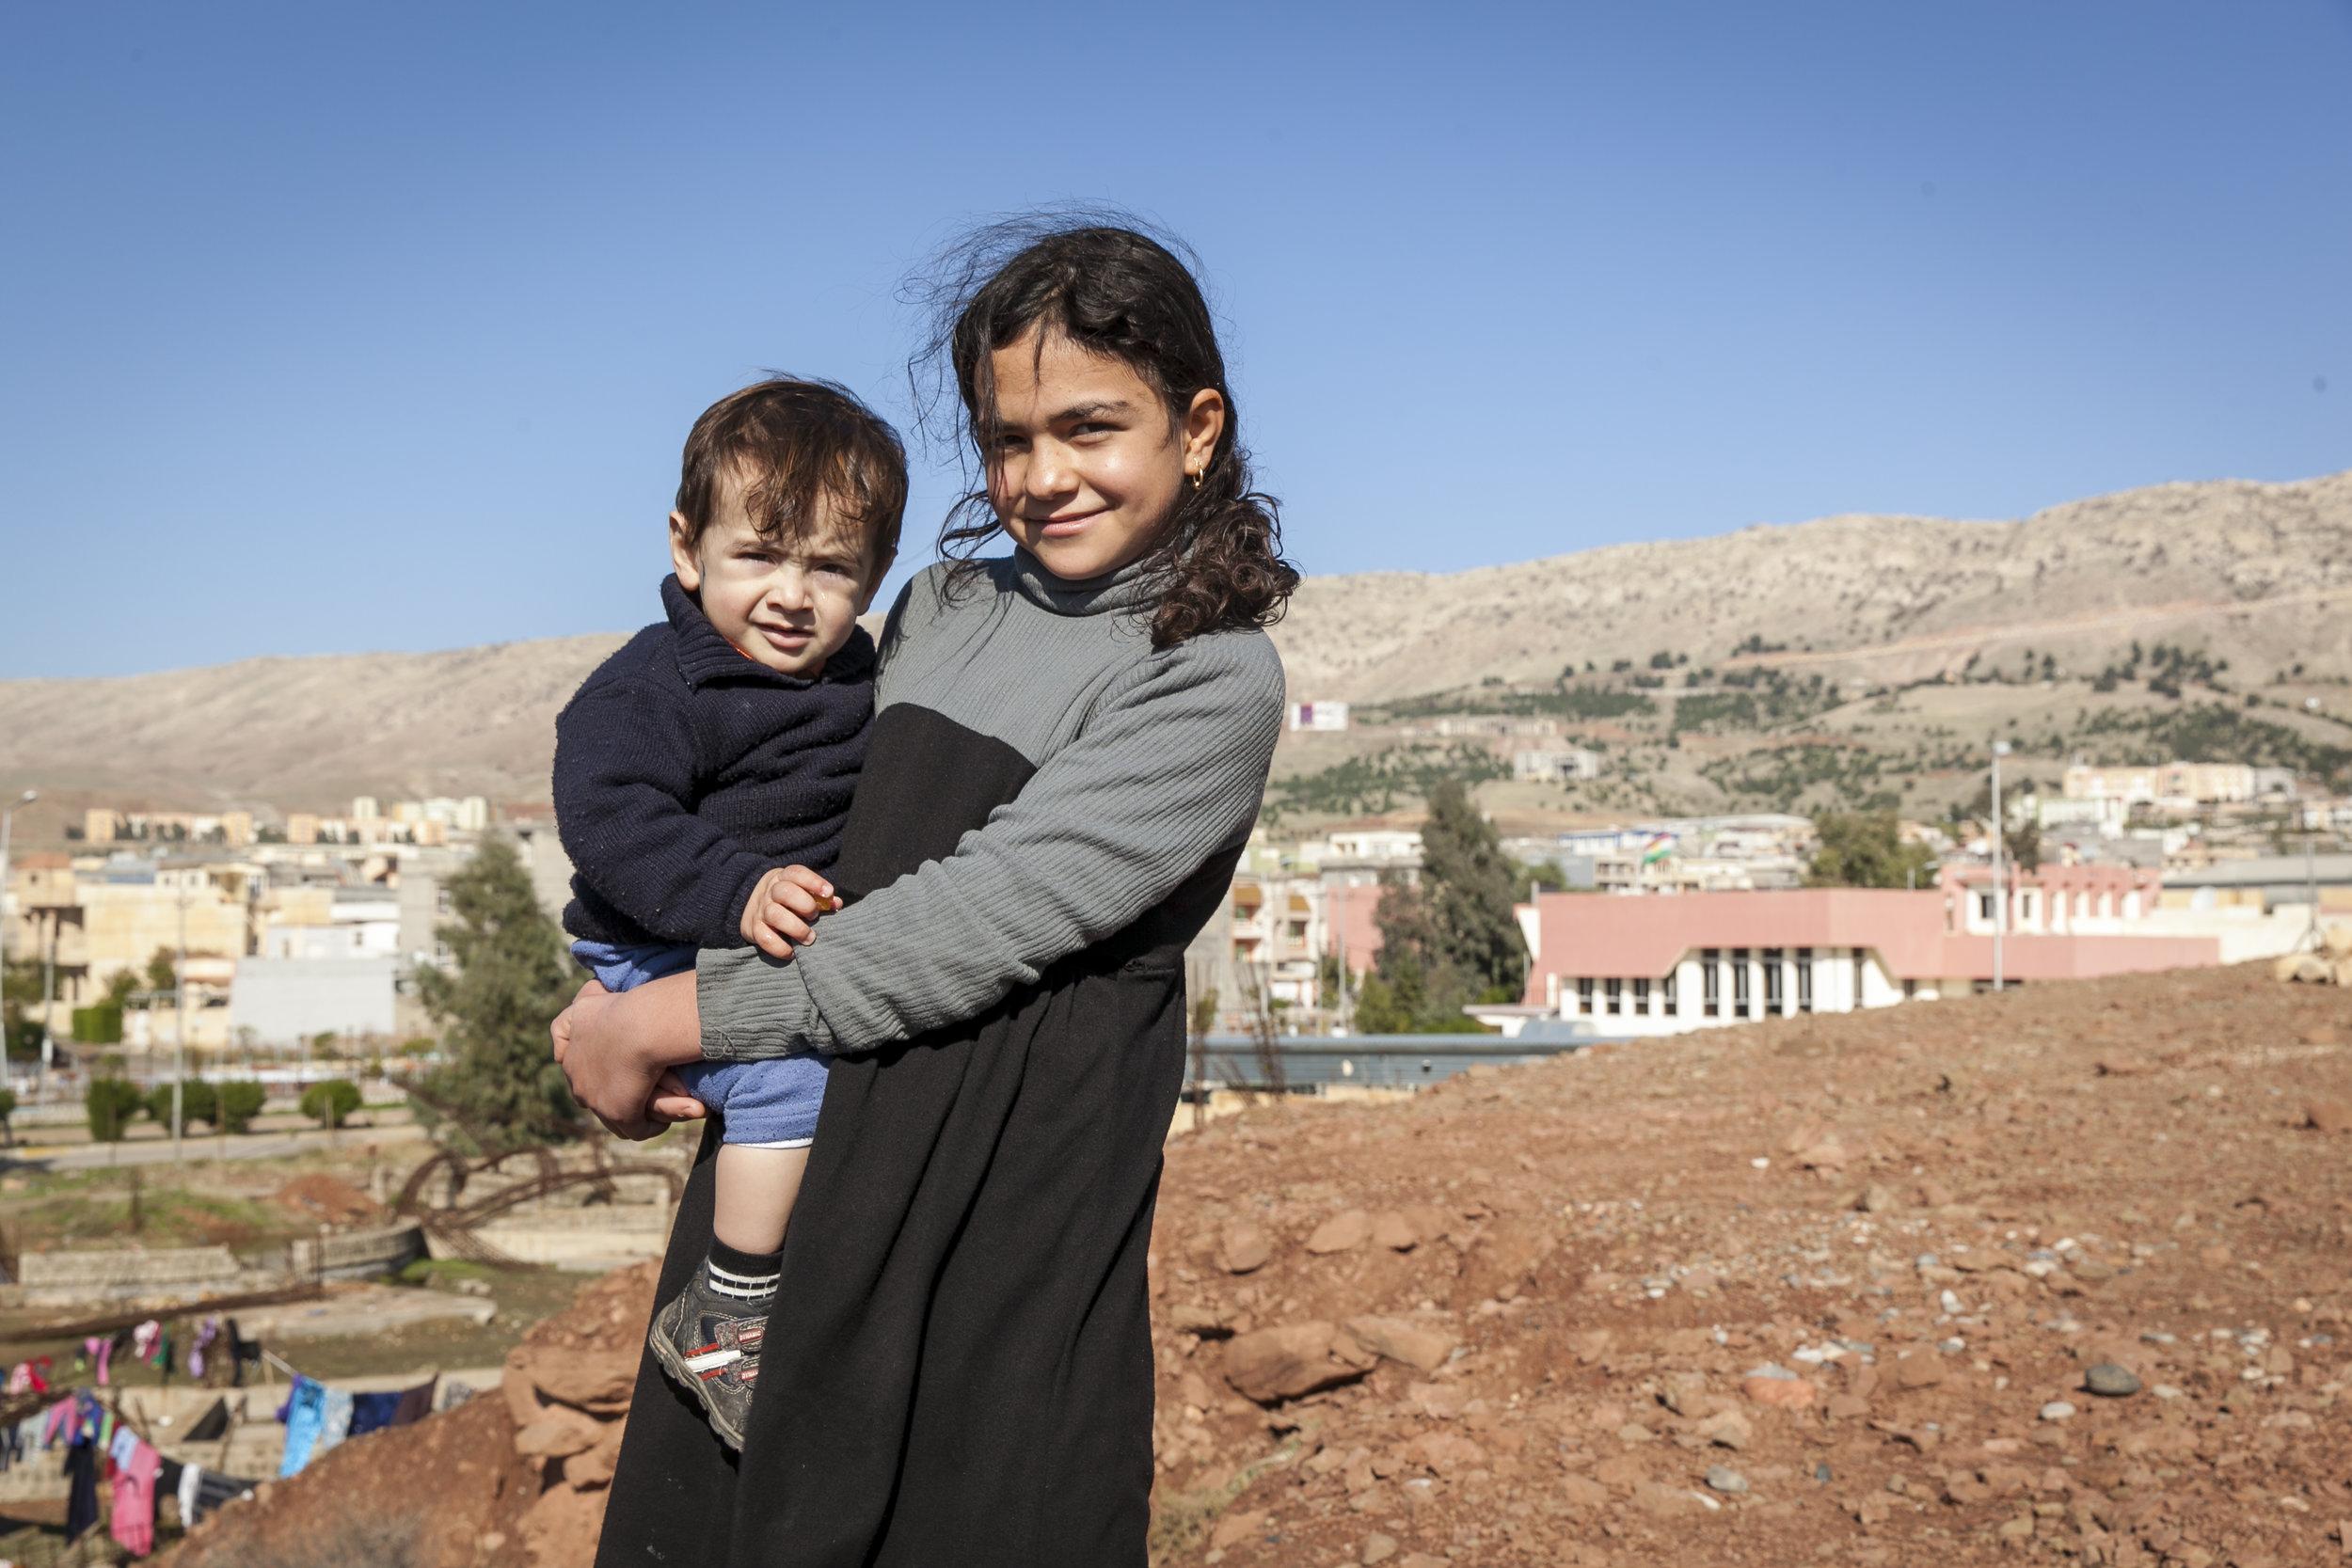 20141204_Refugees_GH_0052.jpg